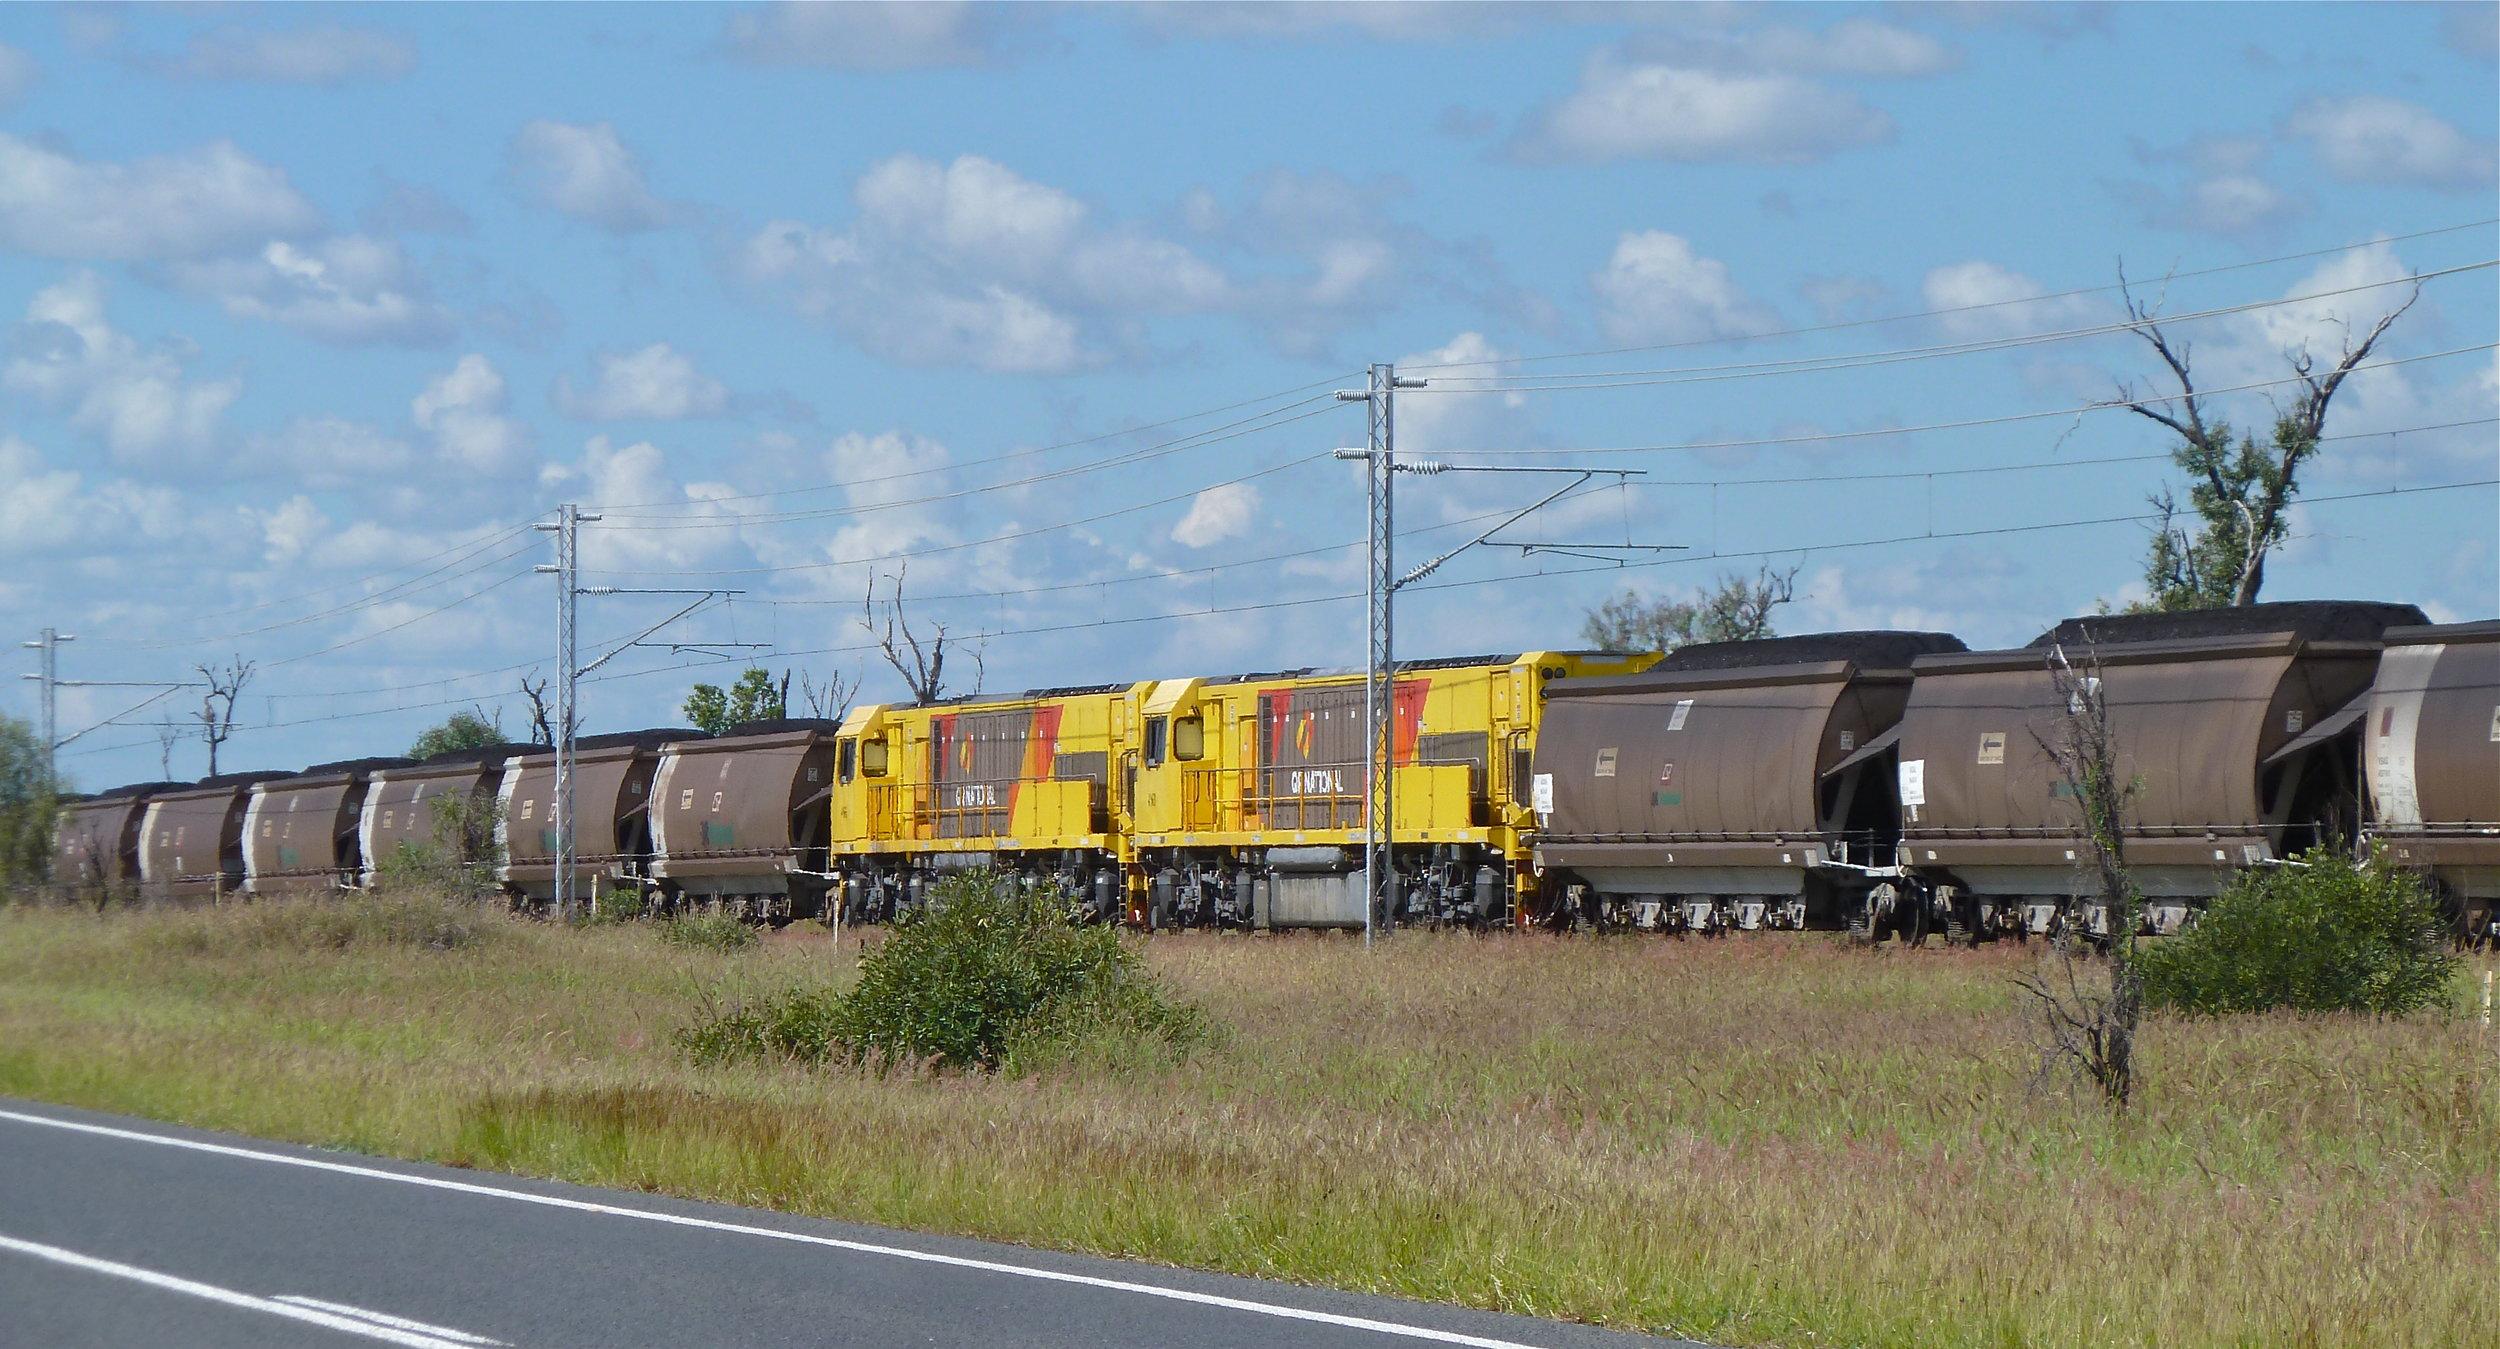 Coal train heading for Gladstone, Central Queensland